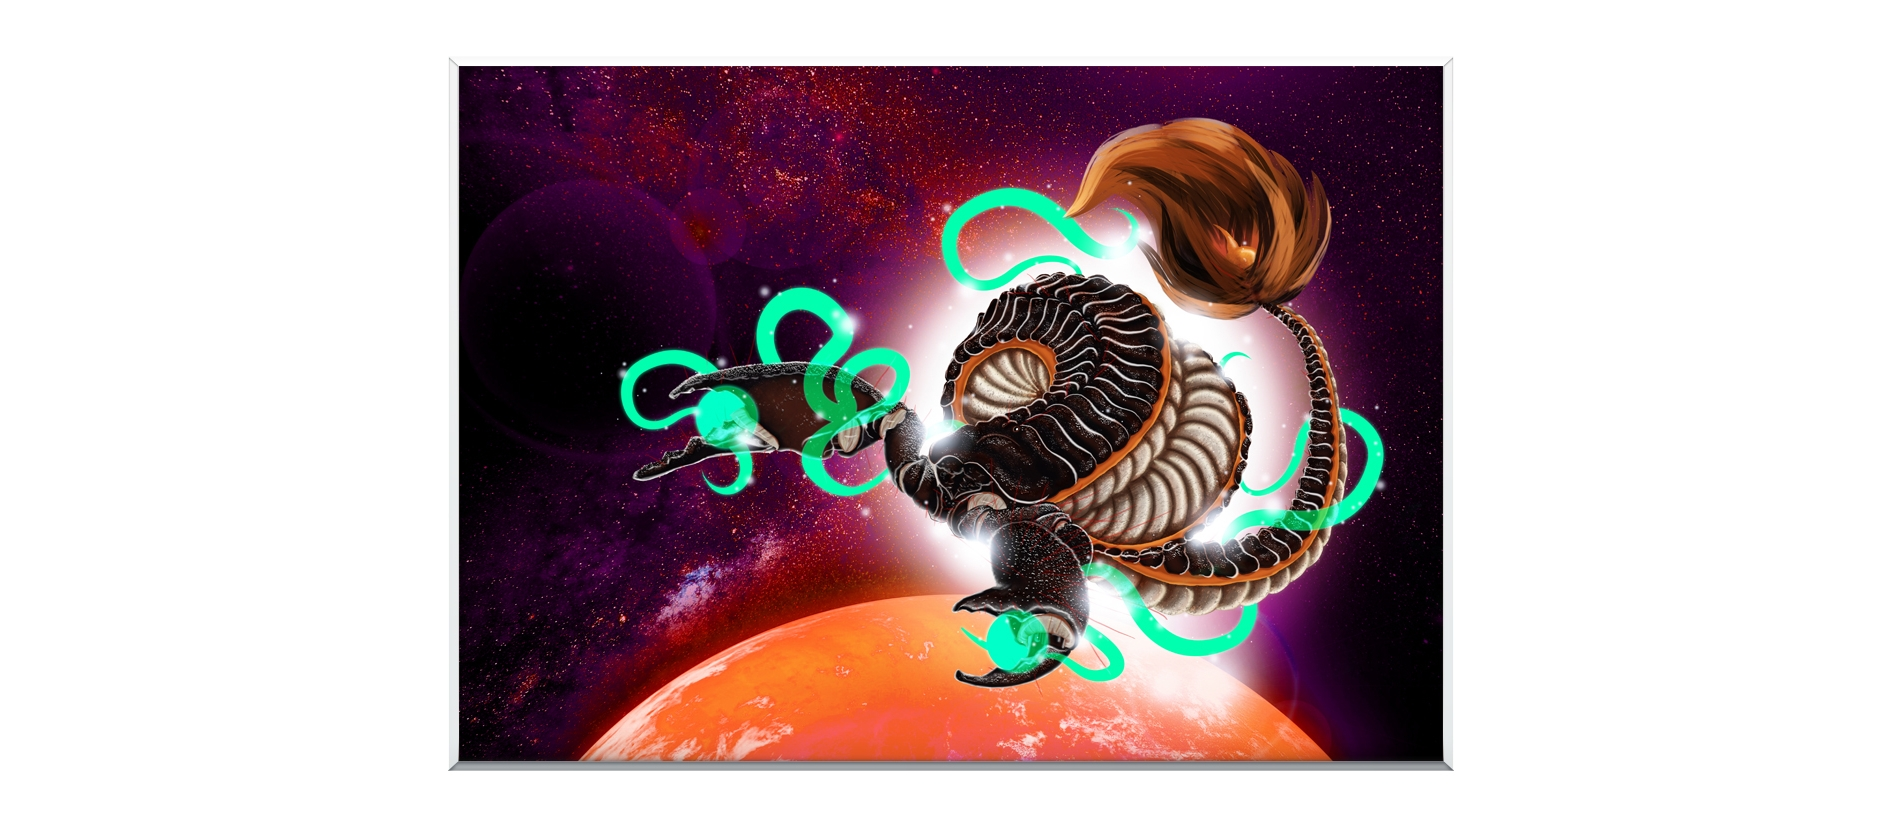 Scorpion Dragon - Zodiac - Bono Mourits